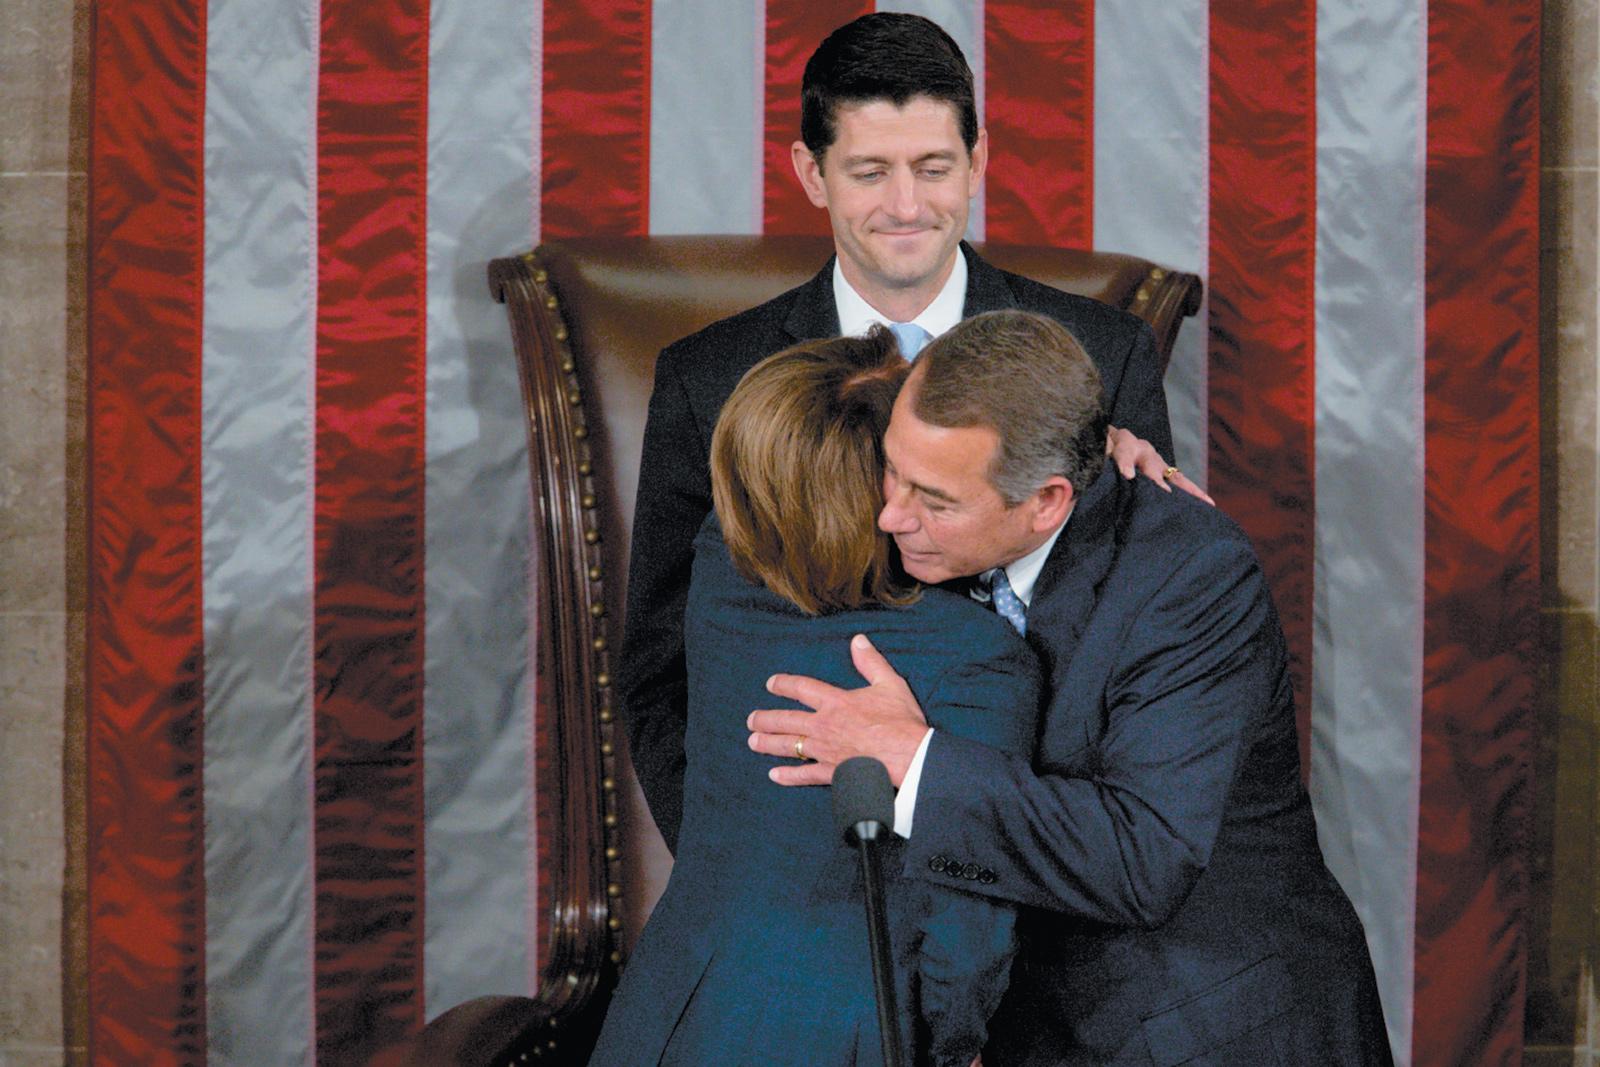 Republican Speaker of the House John Boehner with Democrat Nancy Pelosi, the House minority leader, as he passed the speakership to fellow Republican Paul Ryan, Washington, D.C., October 2015